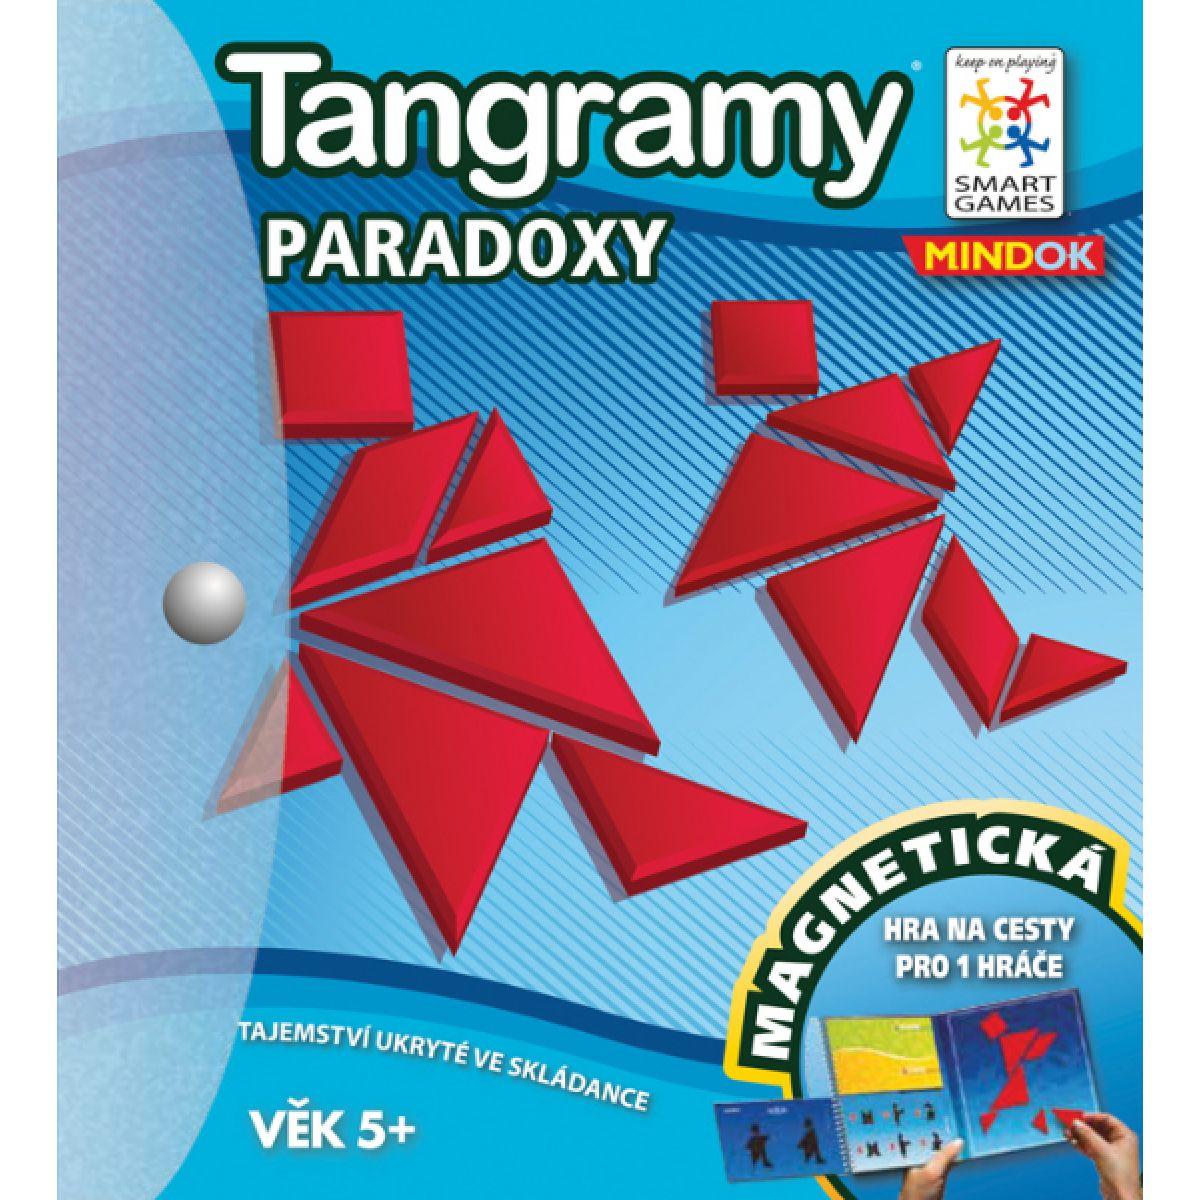 Smart Games Tangramy Paradoxy